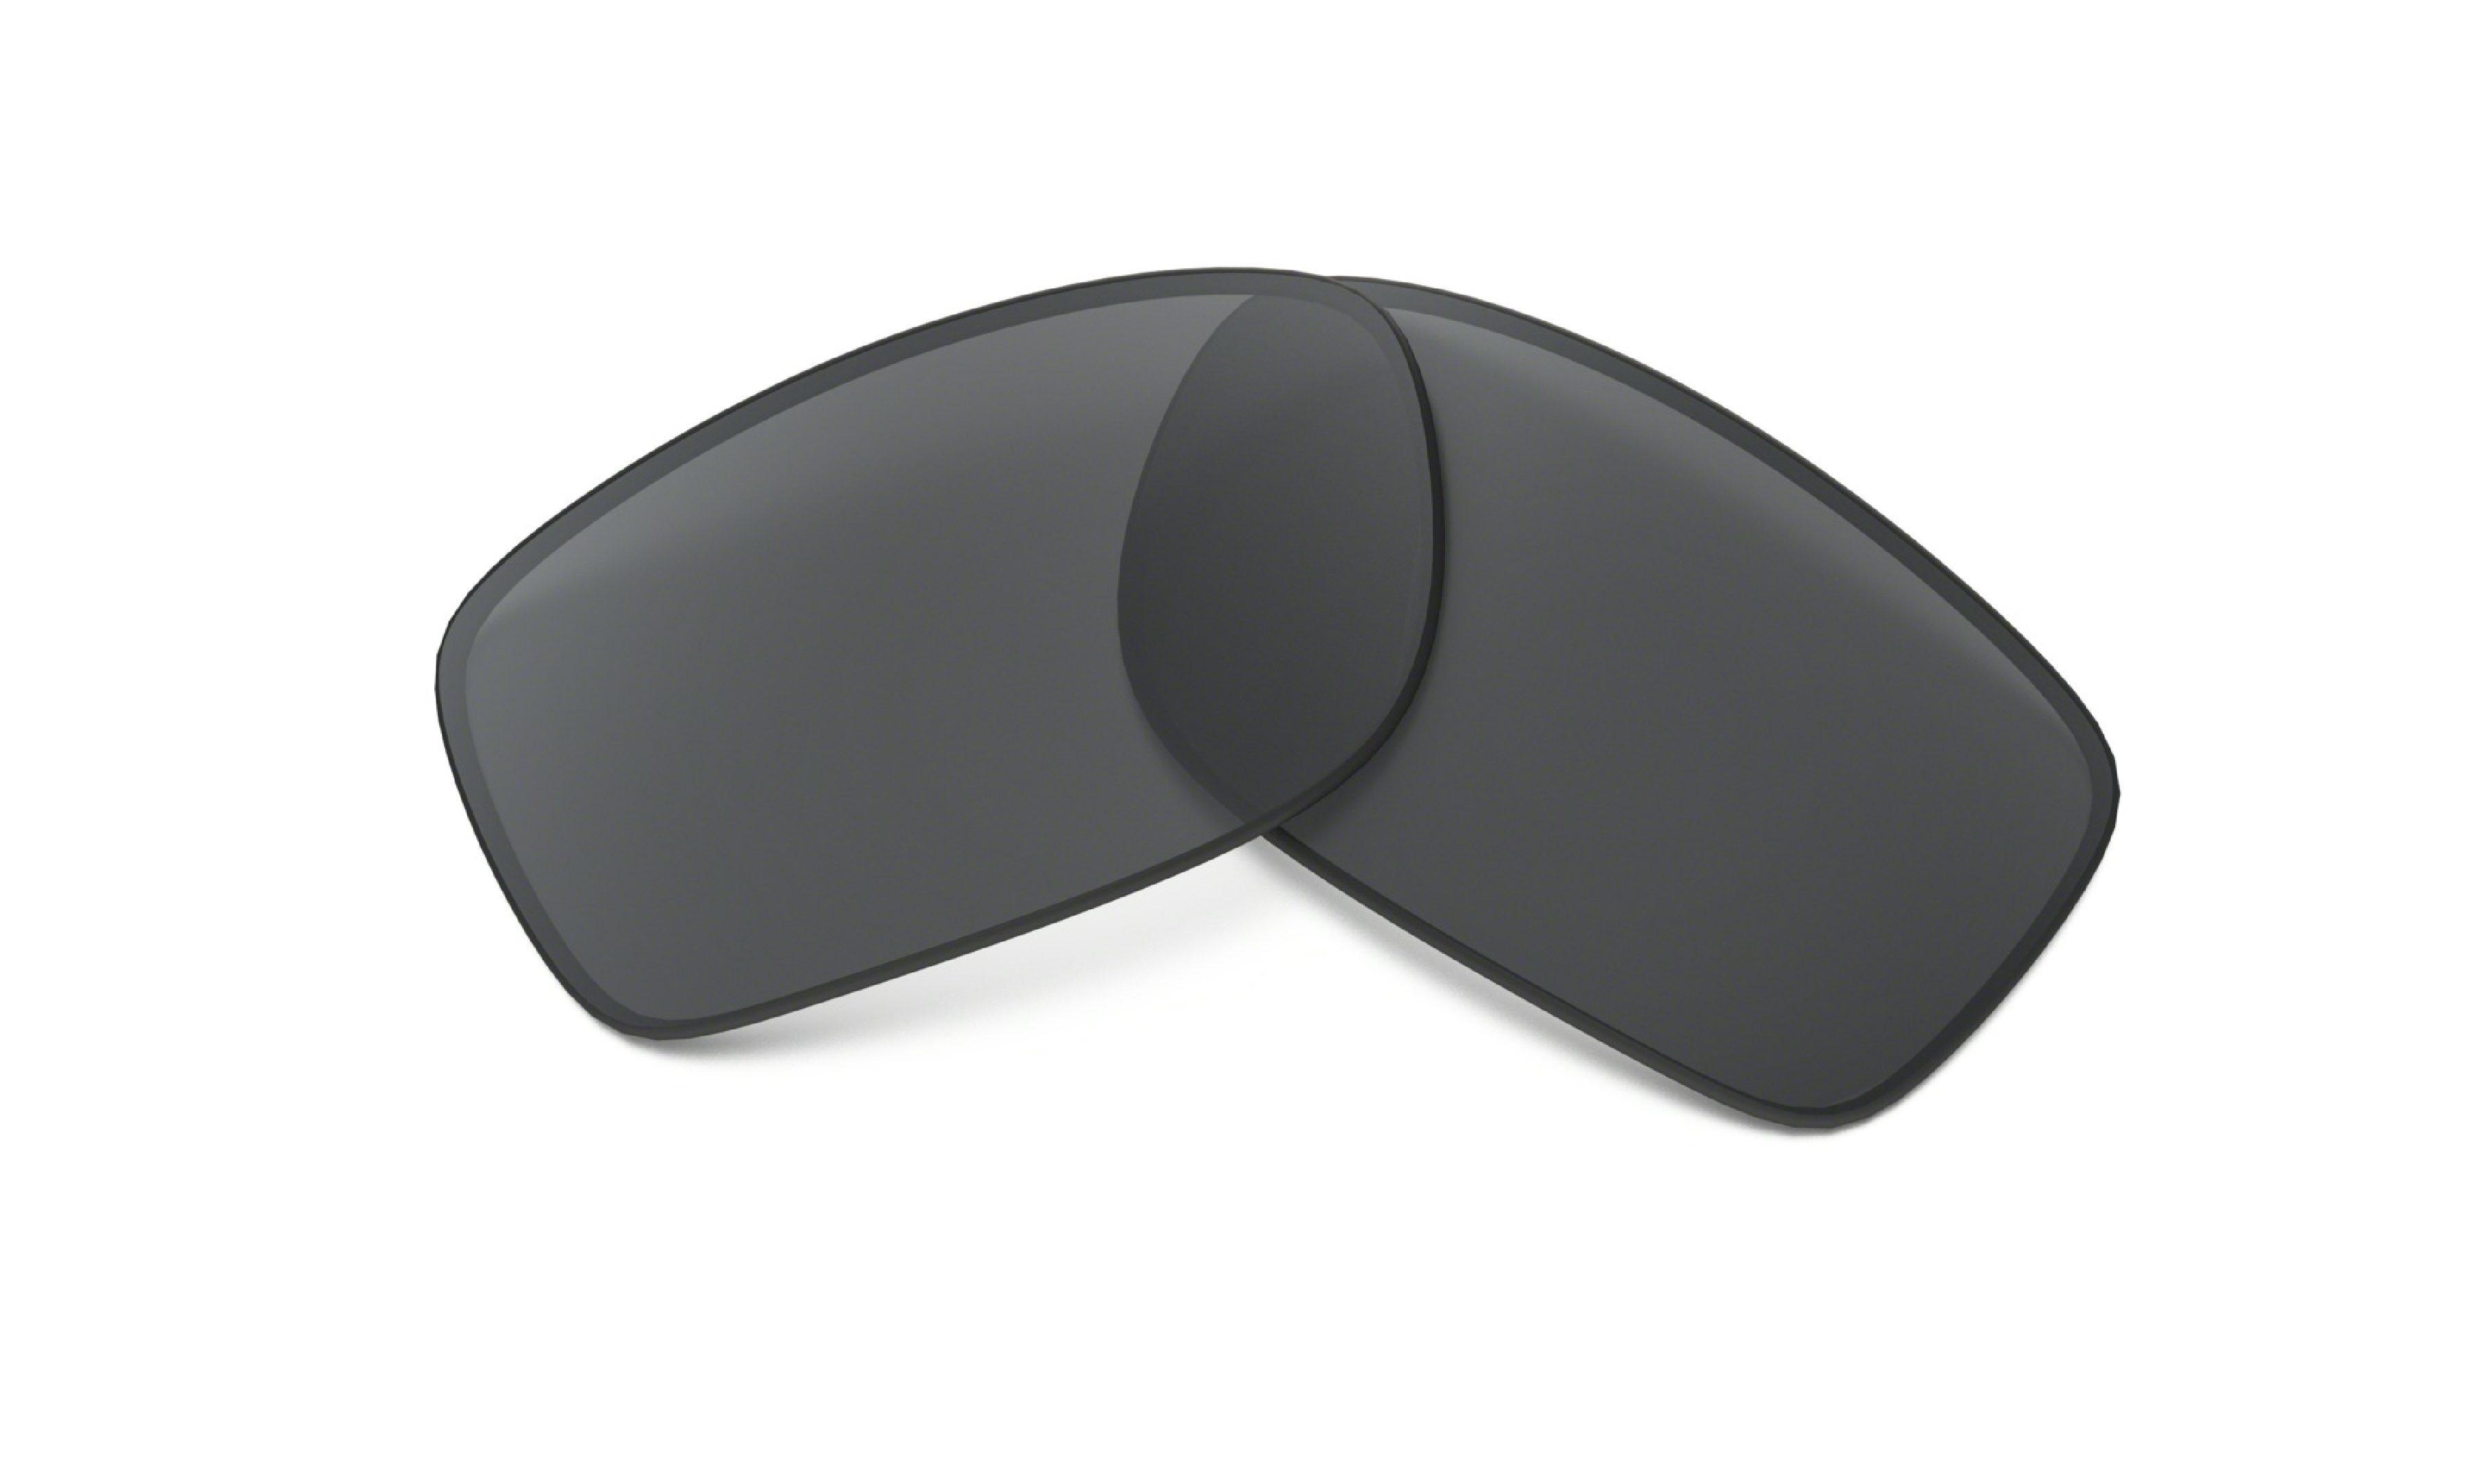 NUR GLÄSER für Modell: 9238 Fives Squared / Glasfarbe: Grau